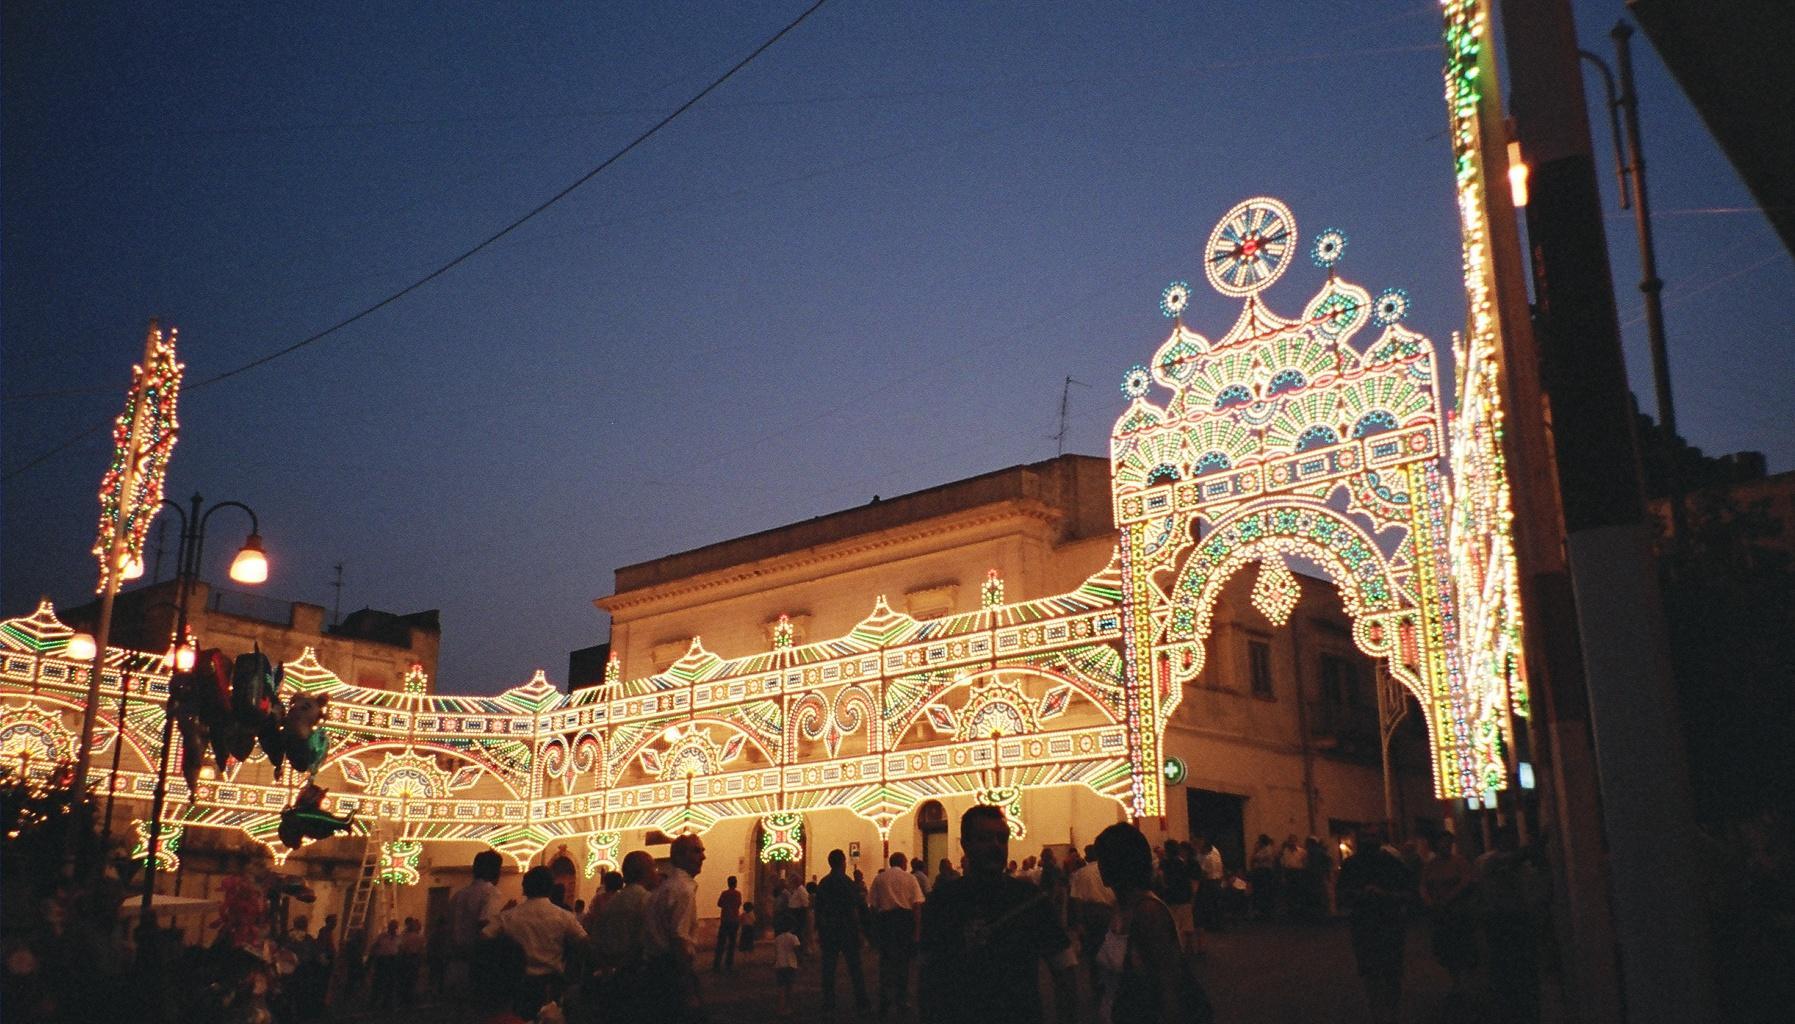 San Rocco 2003